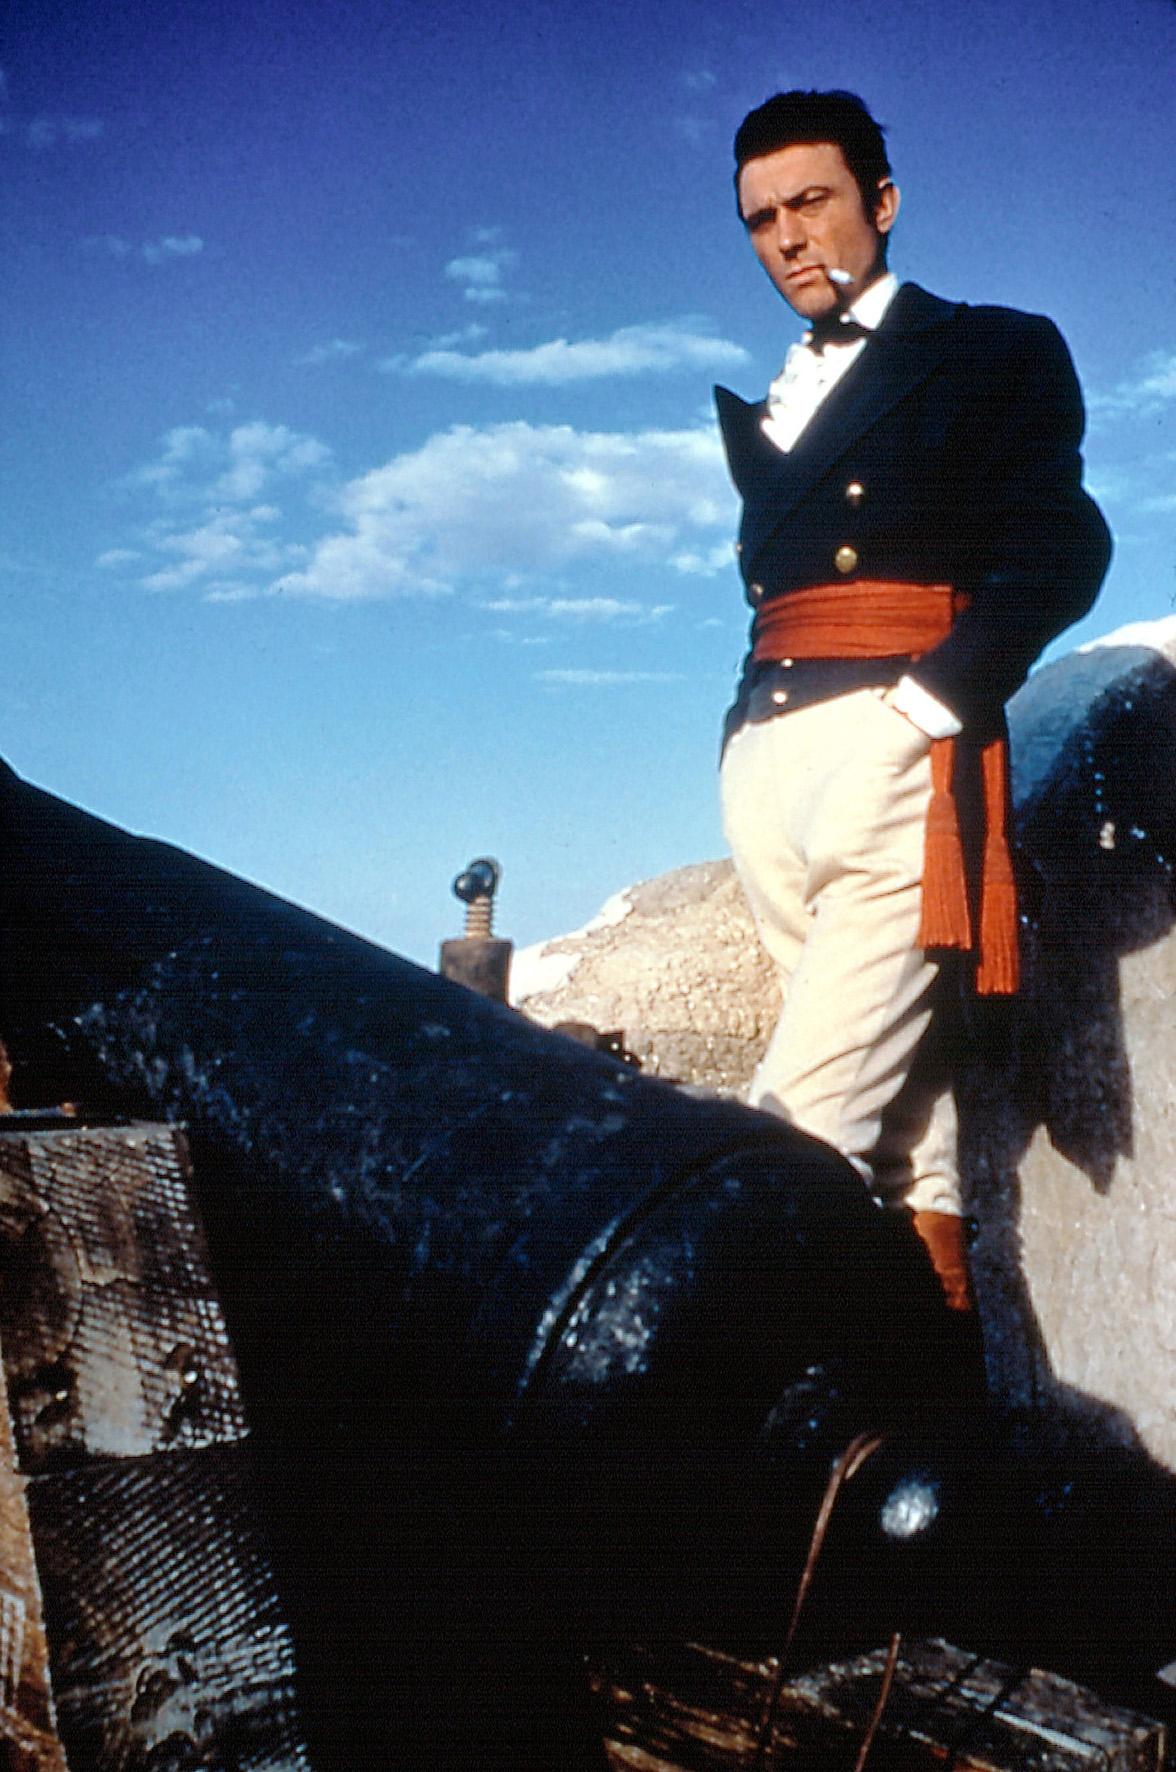 Zur arte-Sendung am 01. Januar 2000 um 20.50 Uhr Alamo 1: Laurence Harvey als Colonel William Travis Fotos: ARTE FRANCE